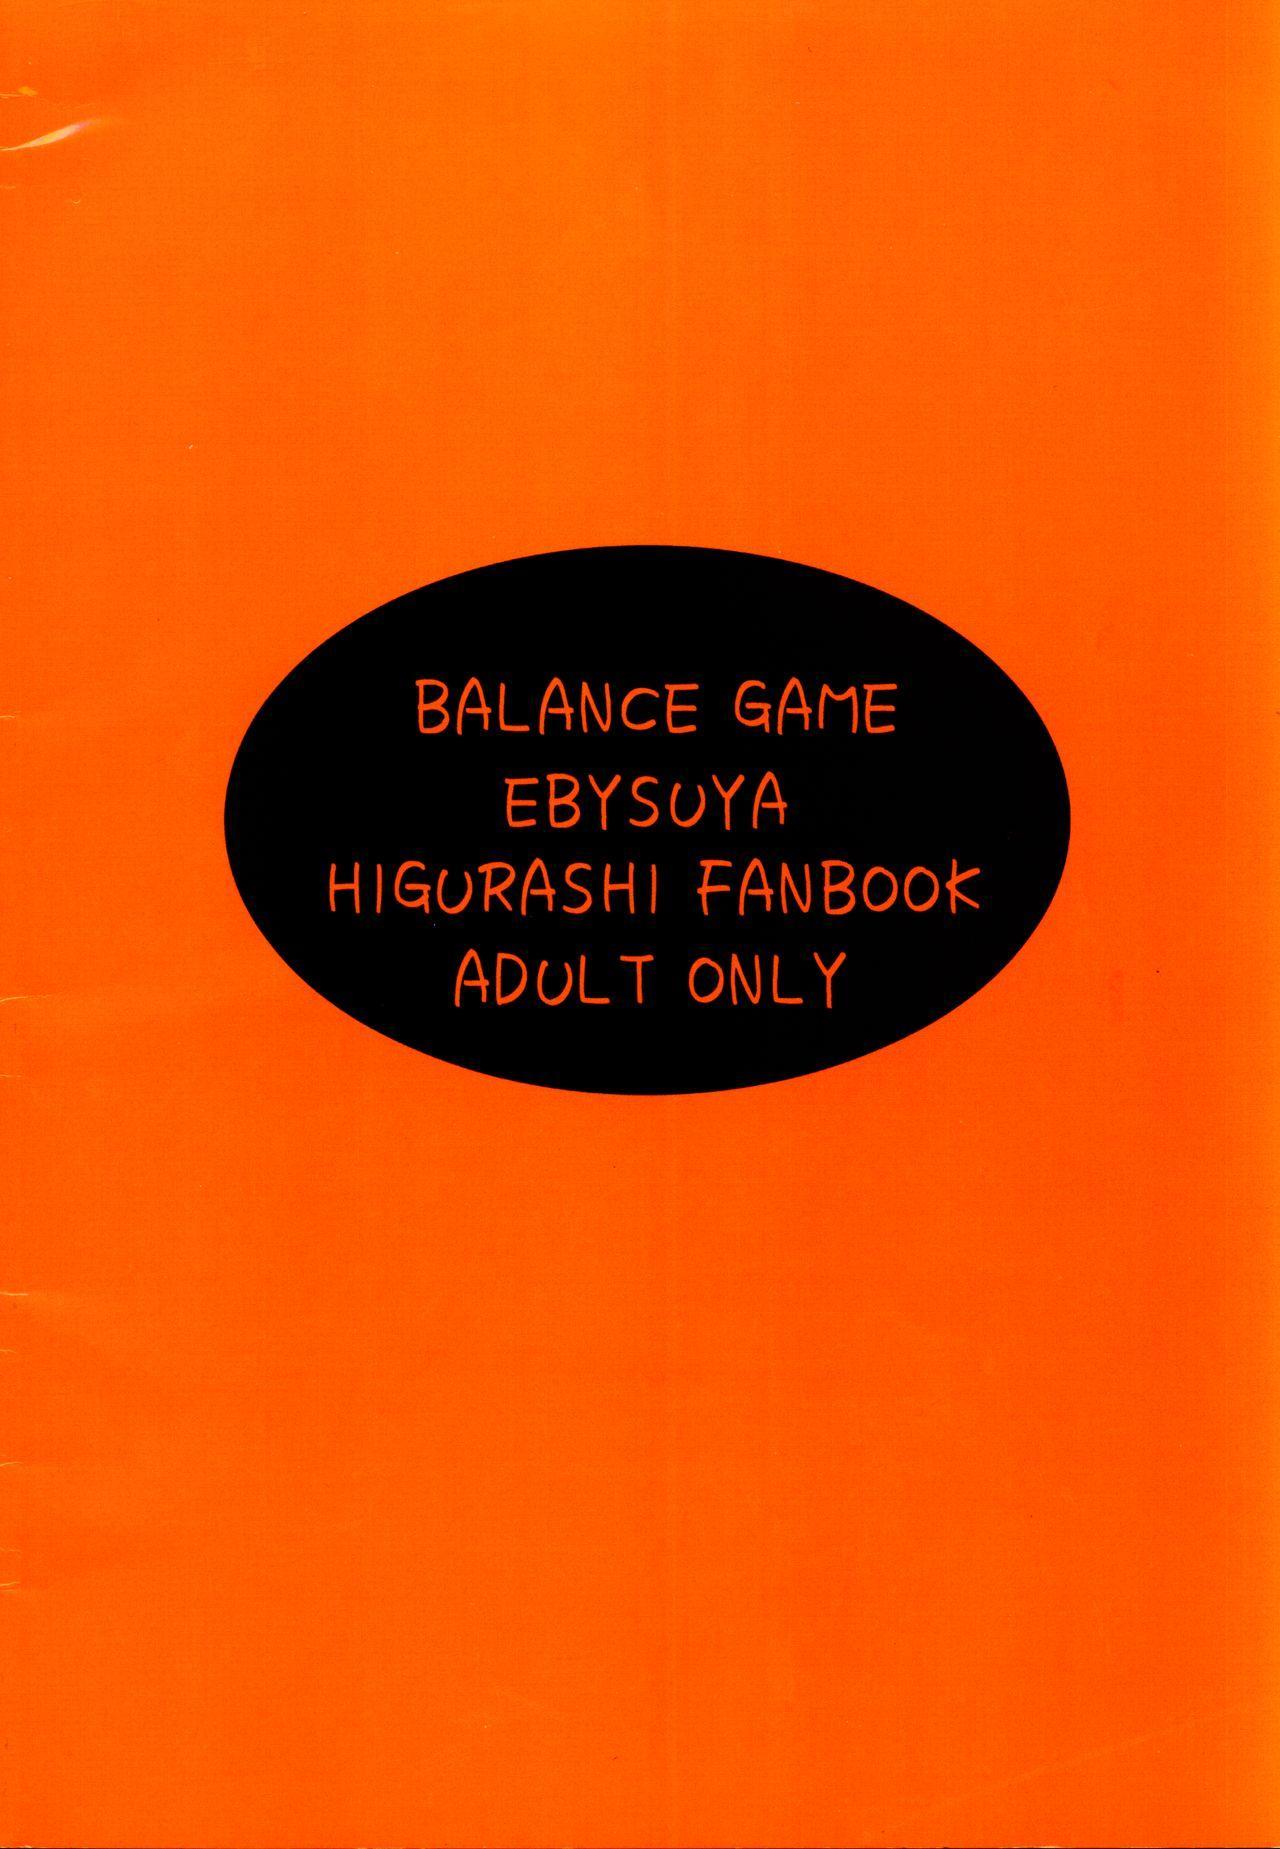 BALANCE GAME 22